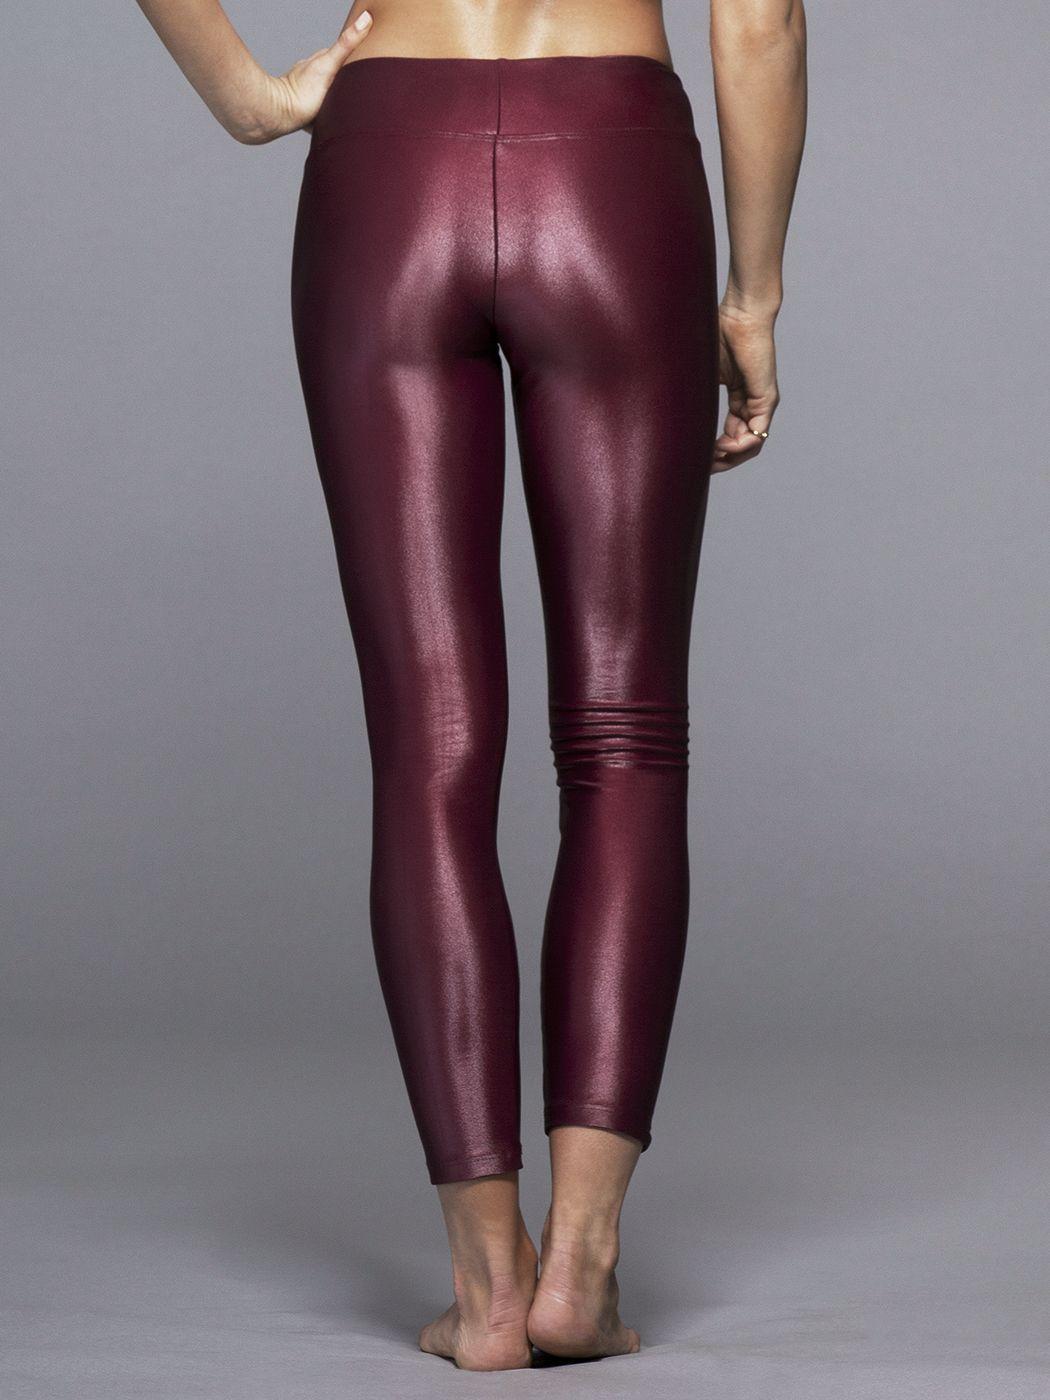 Koral Lustrous Legging  carbon38.com | Workout Chic | Pinterest | Beach wearing Athletic ...